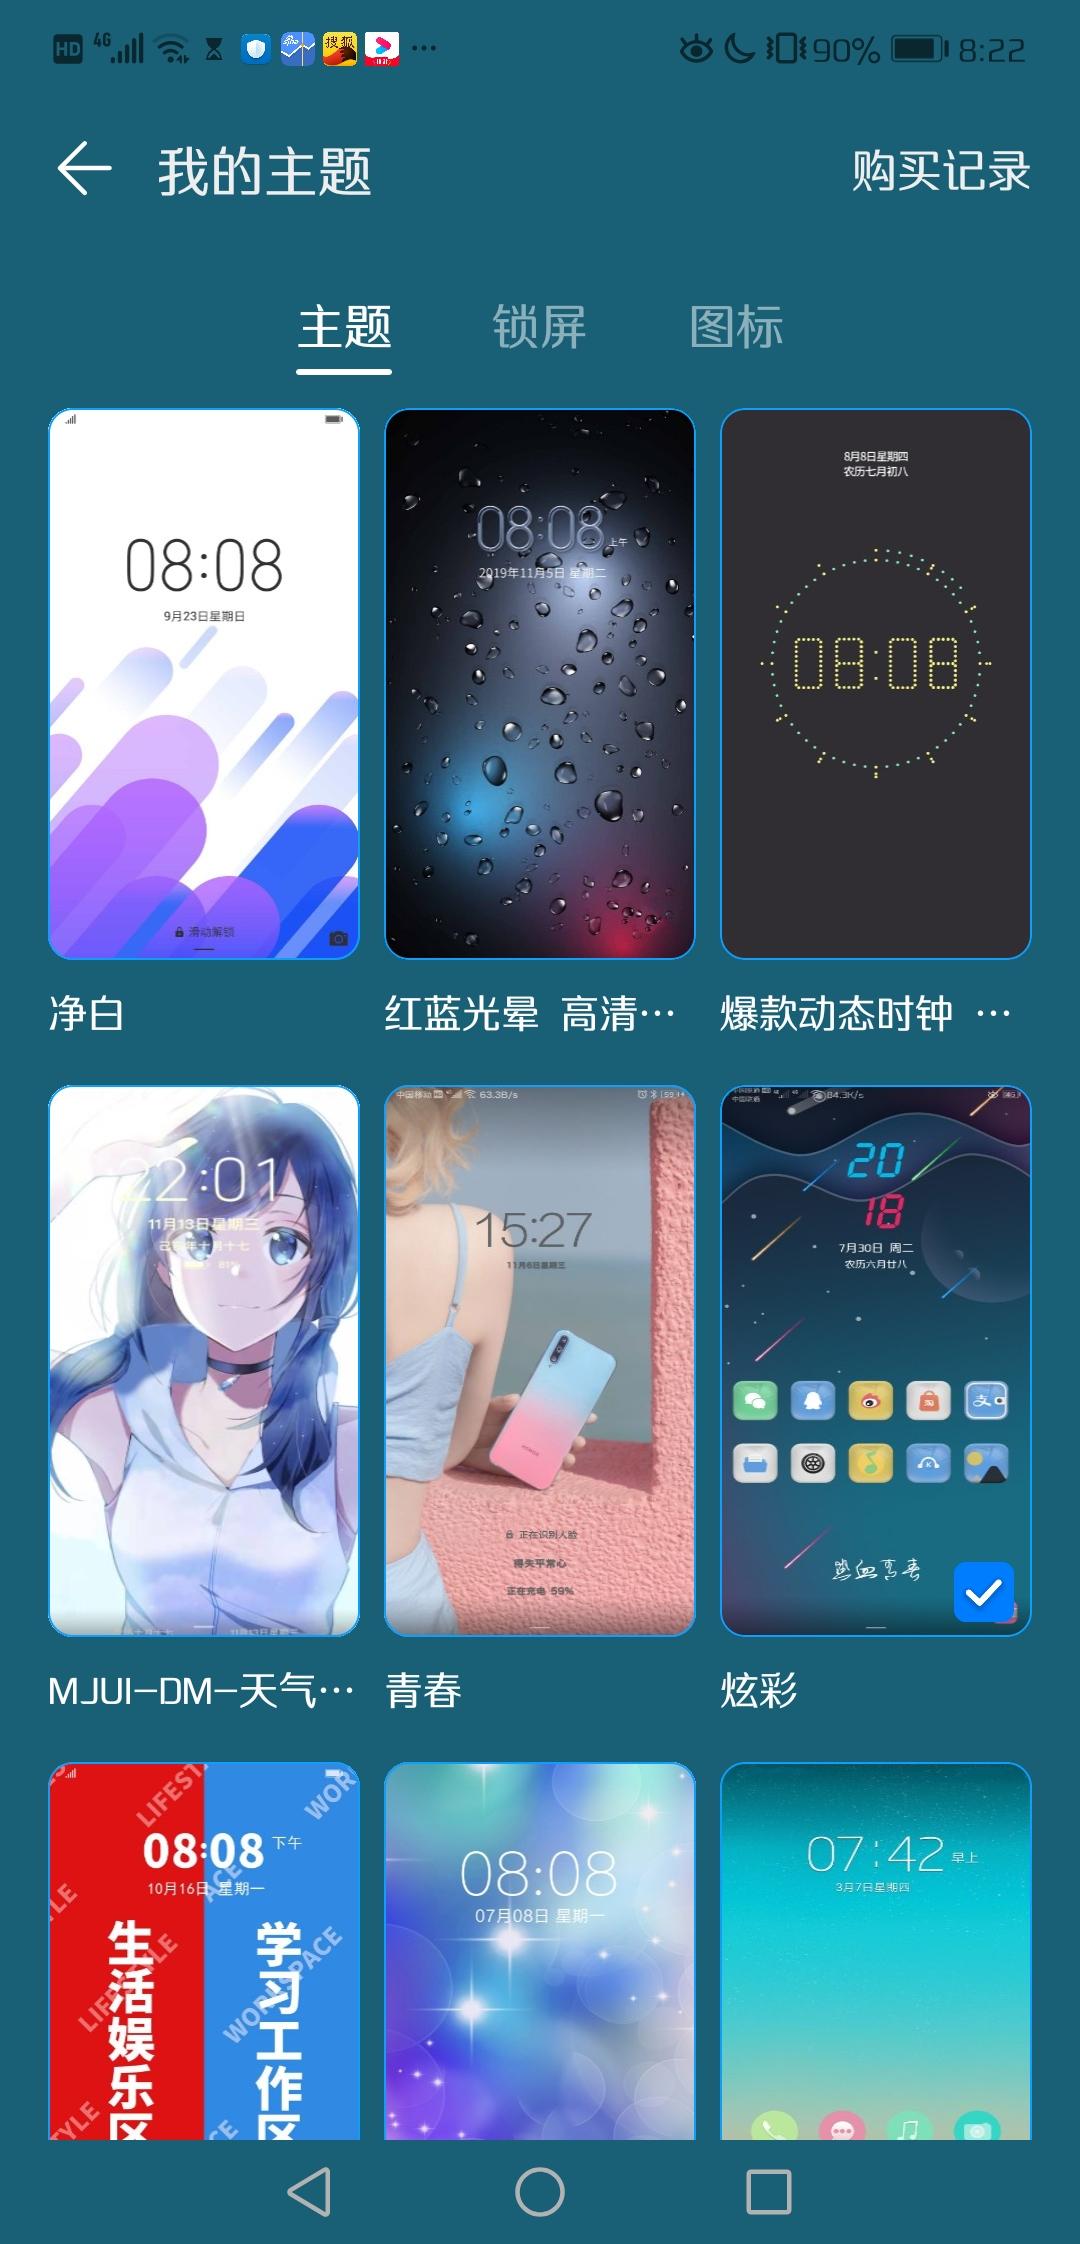 Screenshot_20191115_082224_com.huawei.android.thememanager.jpg